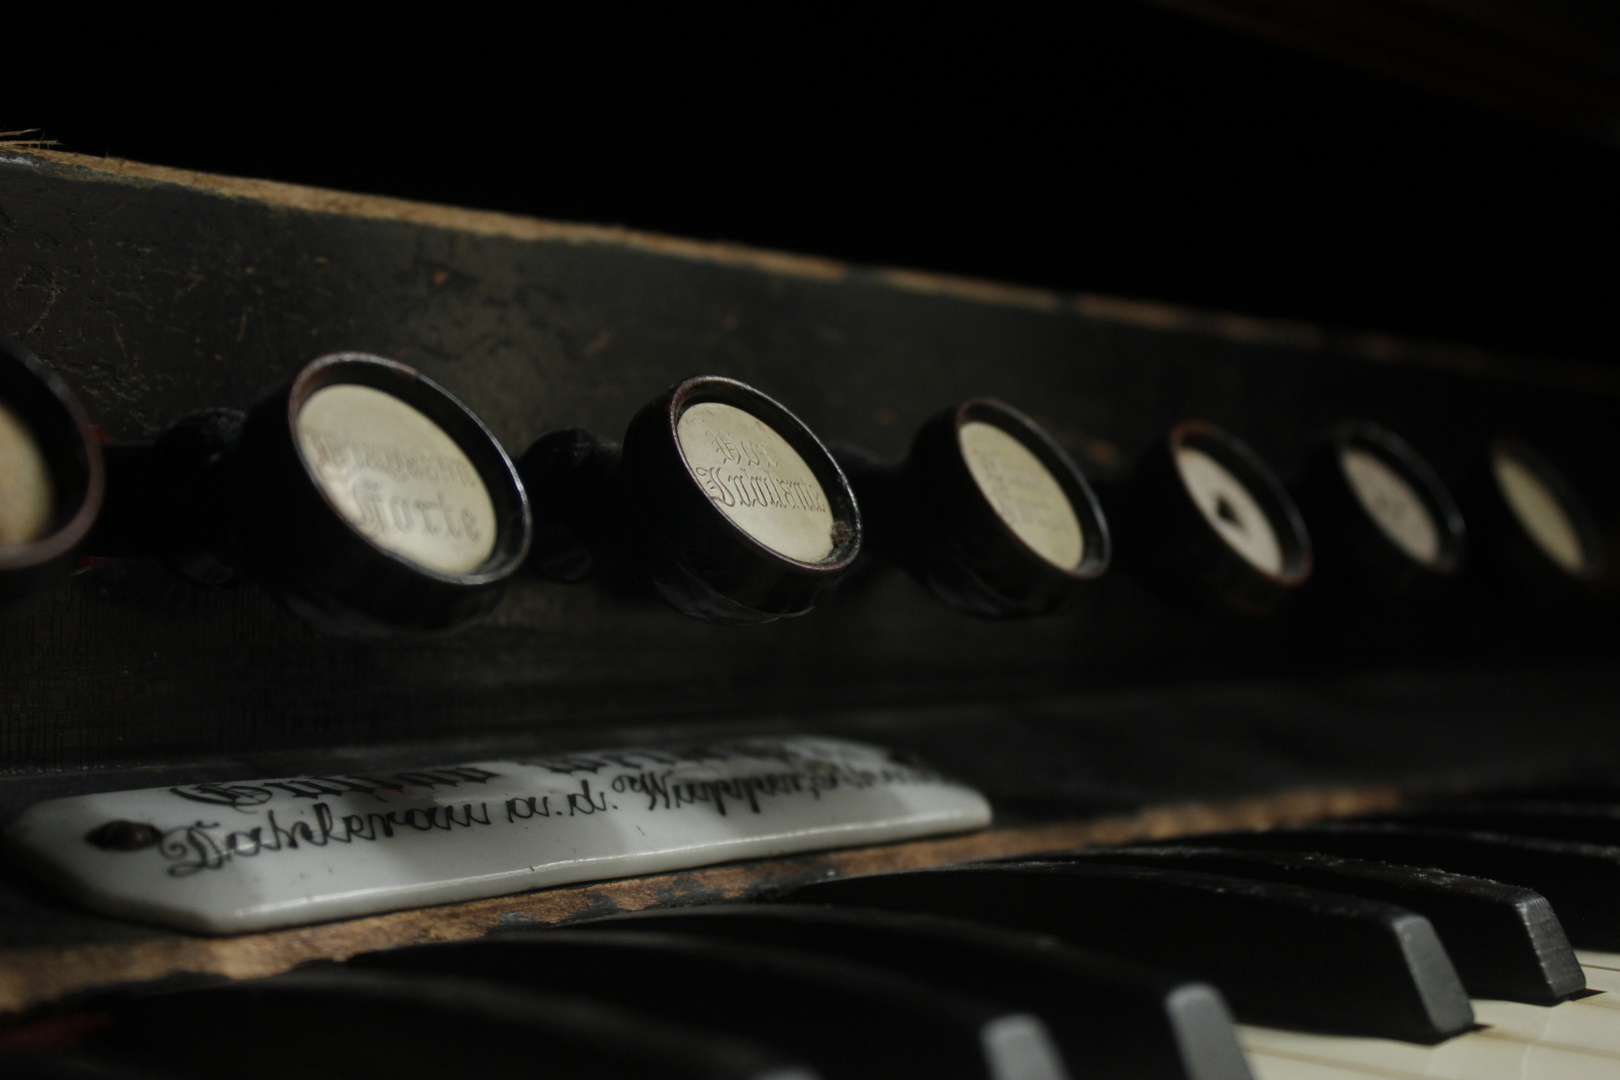 Lost Orgel